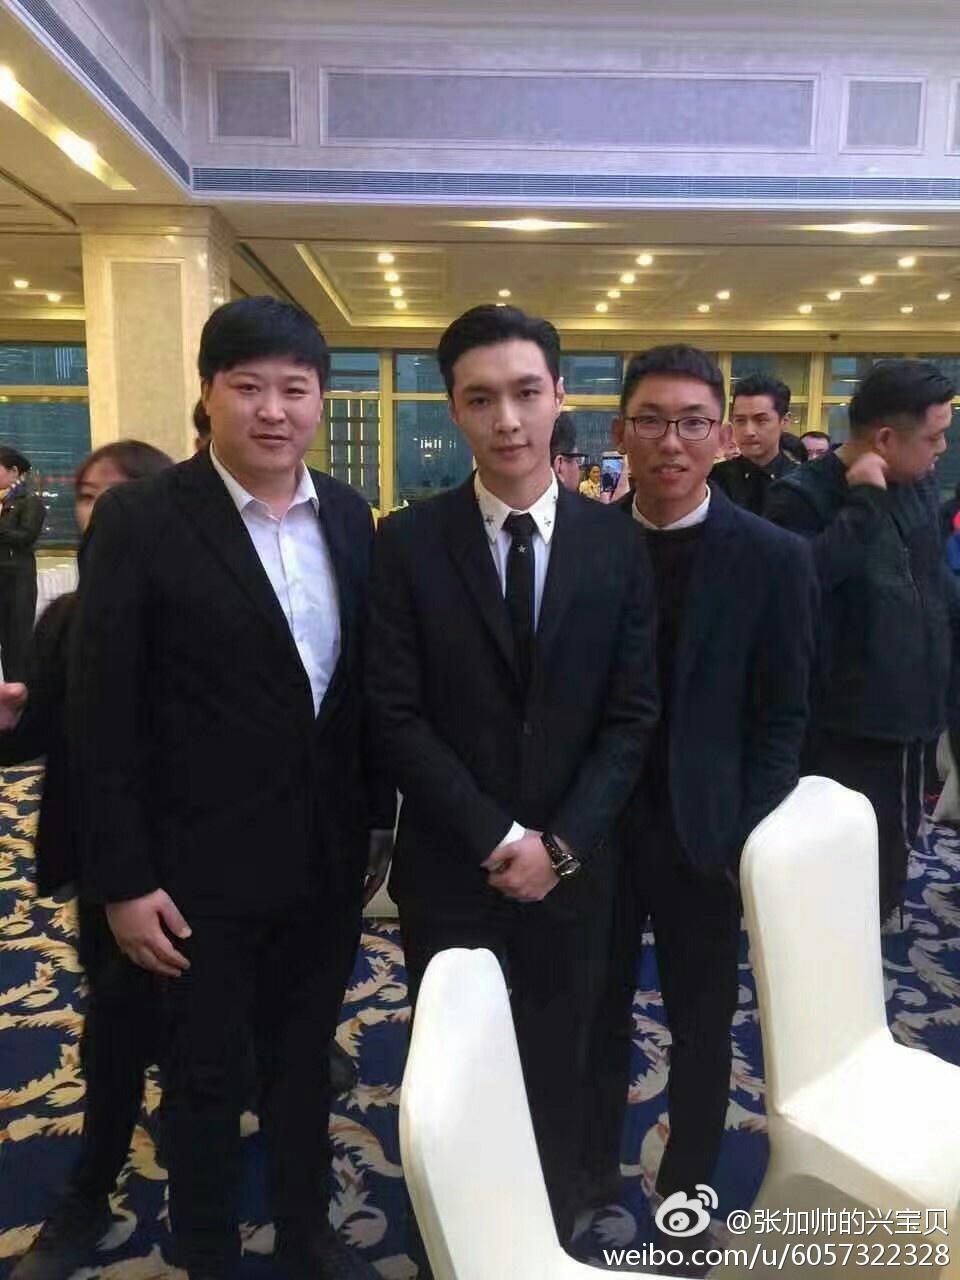 170226 张加帅的兴宝贝 Weibo Update with Lay